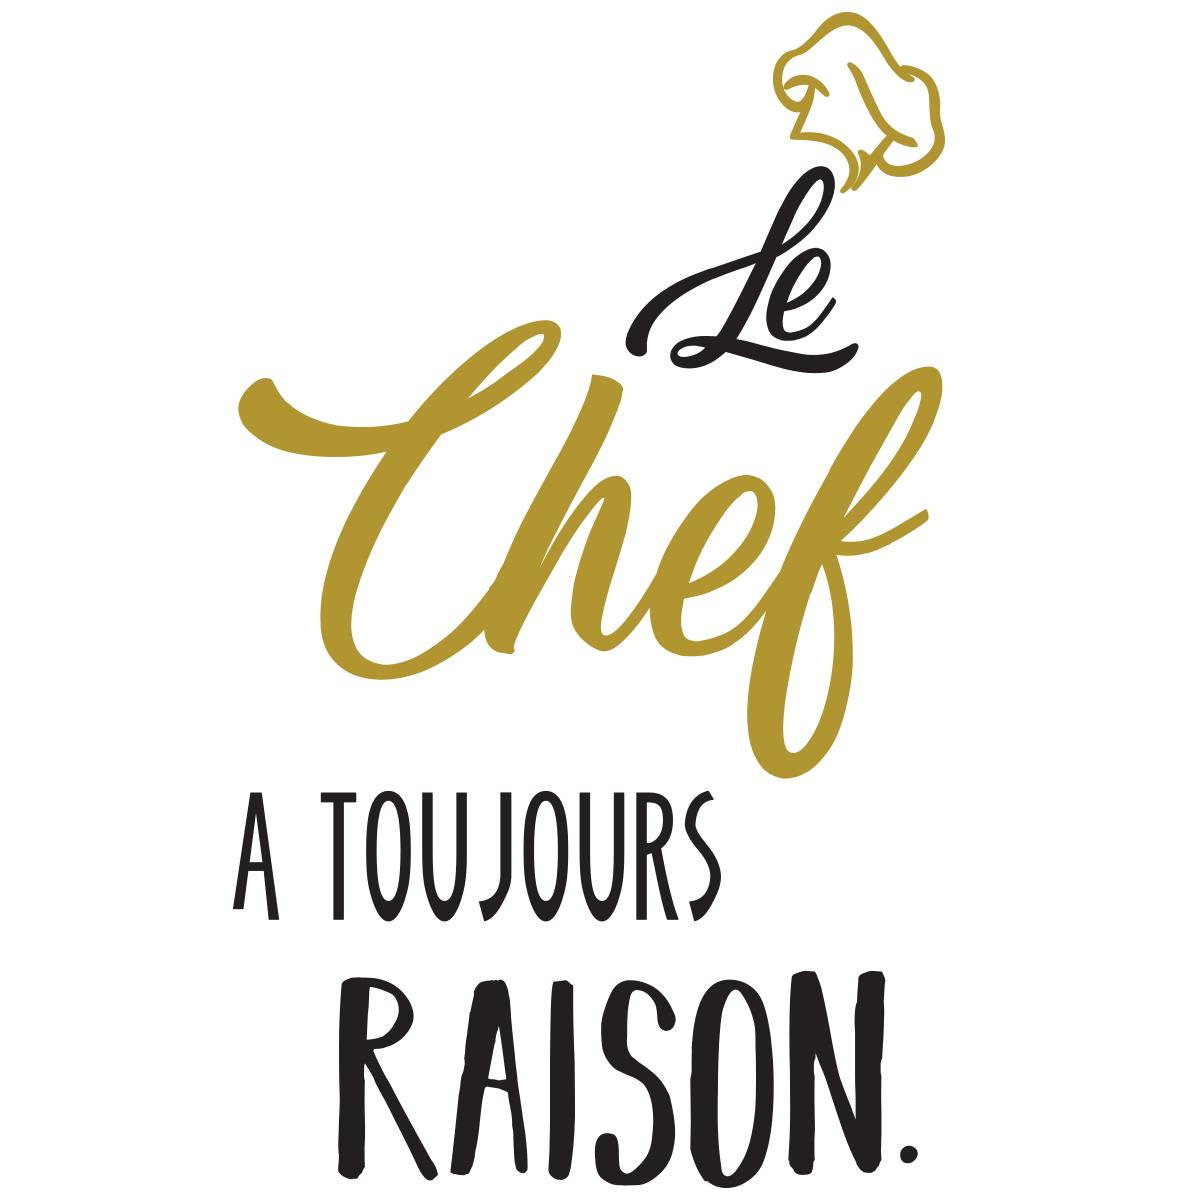 stickers citation le chef a toujours raison stickers citations cuisine ambiance sticker. Black Bedroom Furniture Sets. Home Design Ideas